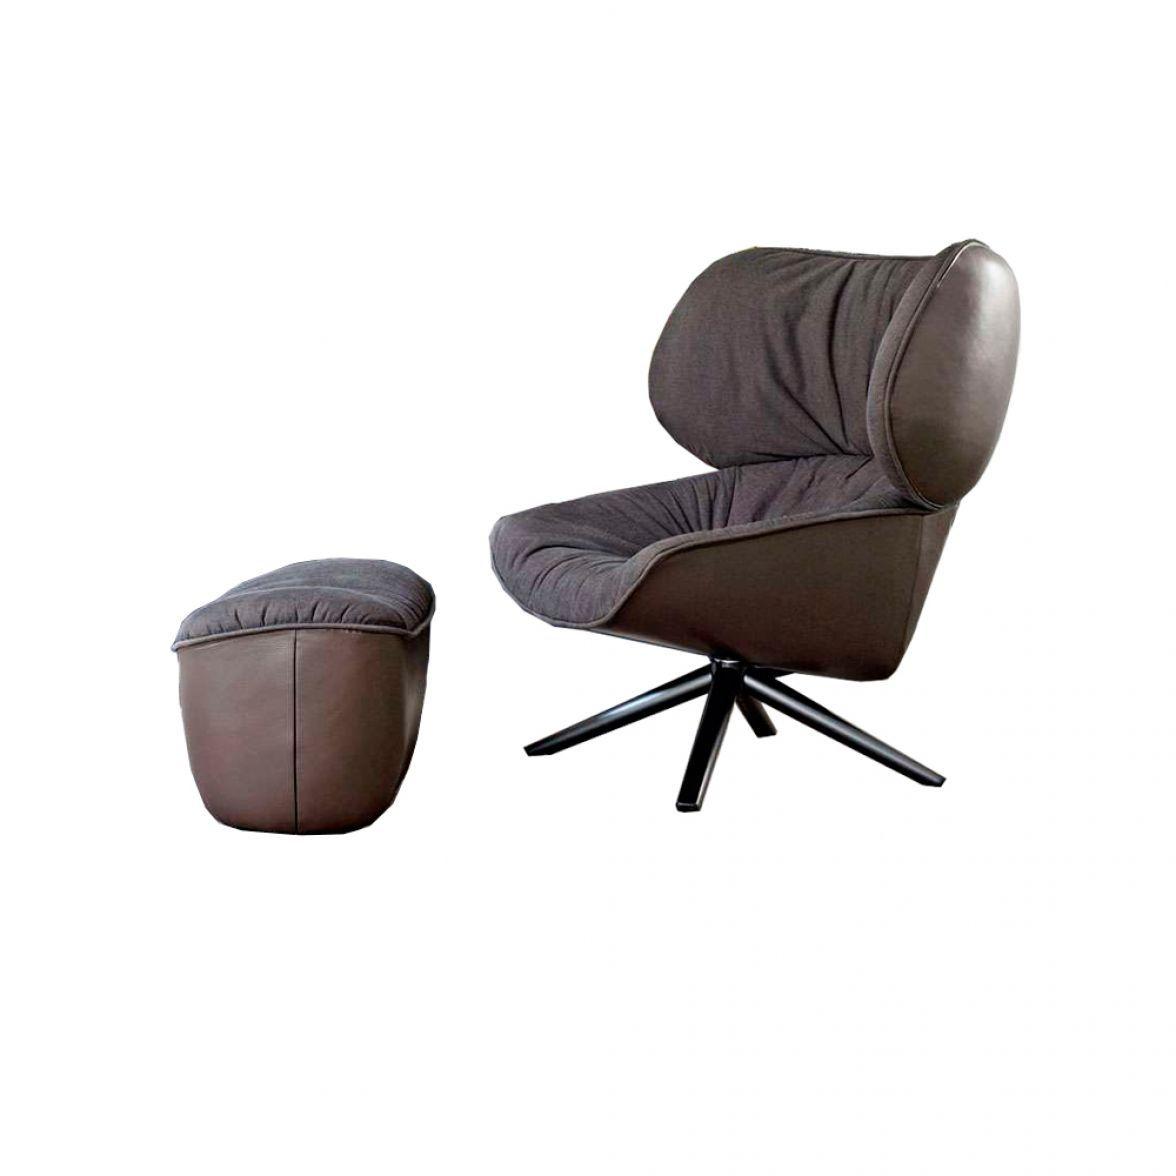 Tabano armchair фото цена